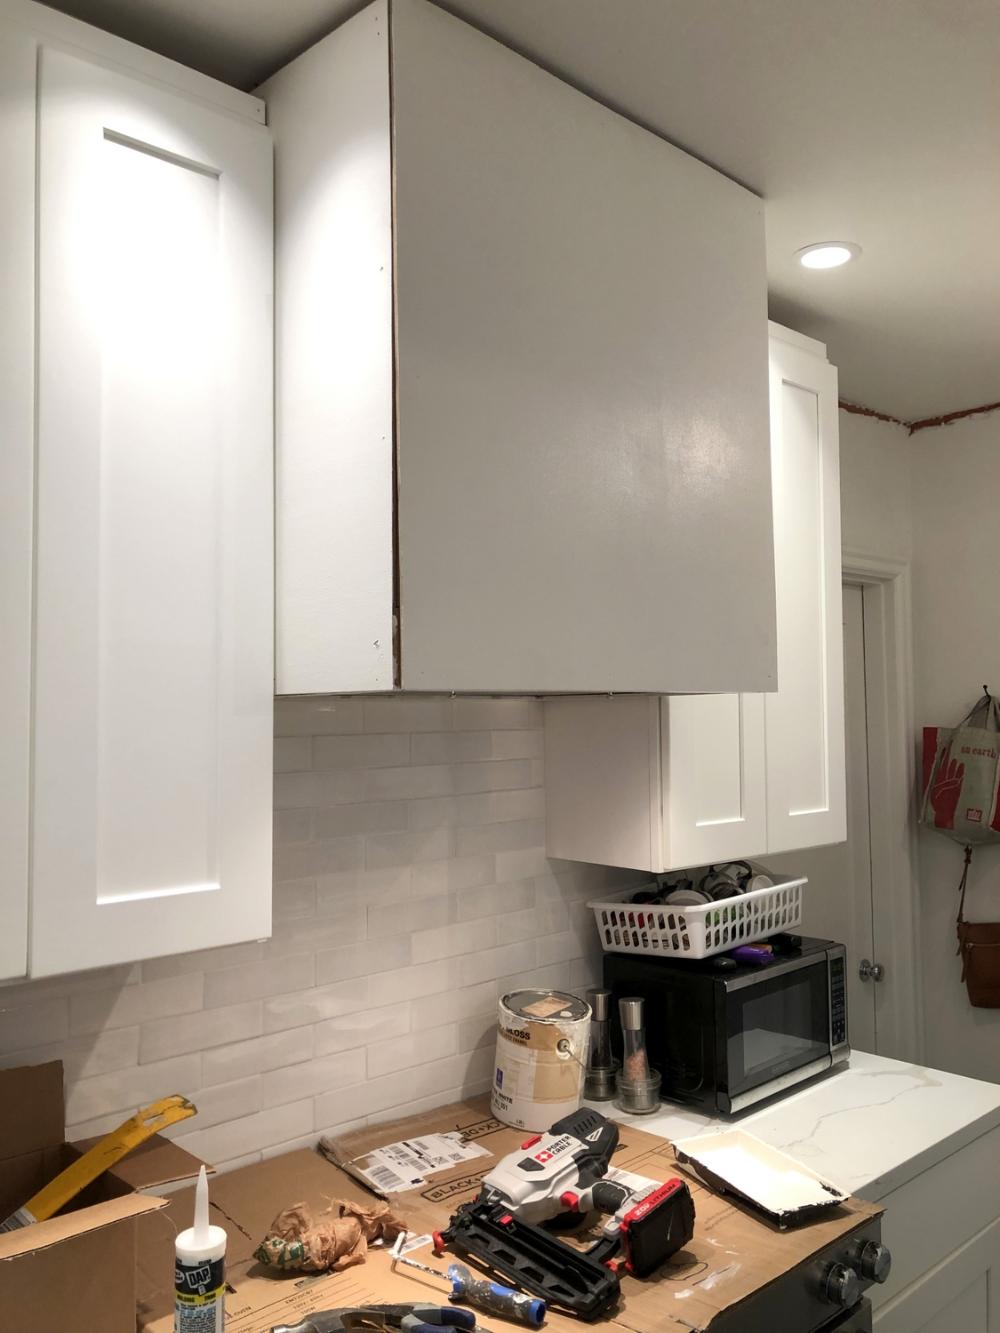 Diy Custom Straight Sided Vent Hood With Zephyr Insert In 2020 Kitchen Vent Hood Vent Hood Kitchen Vent